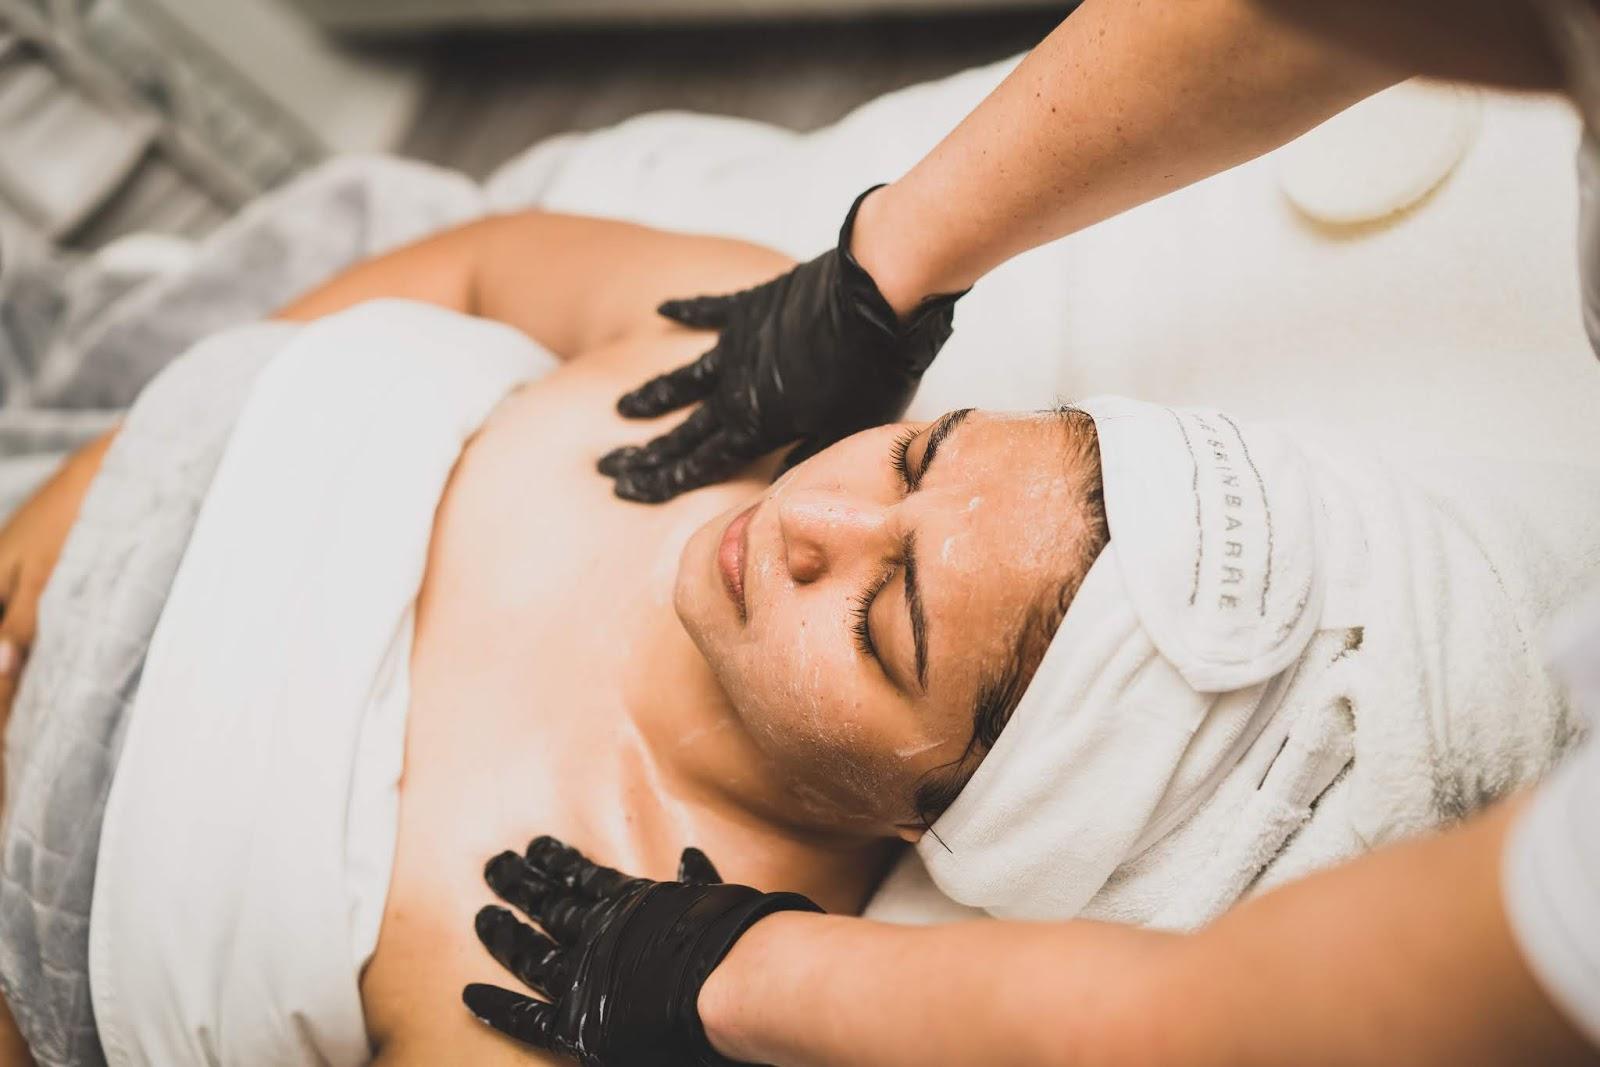 skinbarre med spa experience, facial peel, collagen, beauty, DC blogger, DMV blogger, holiday ready skin, myriad musings